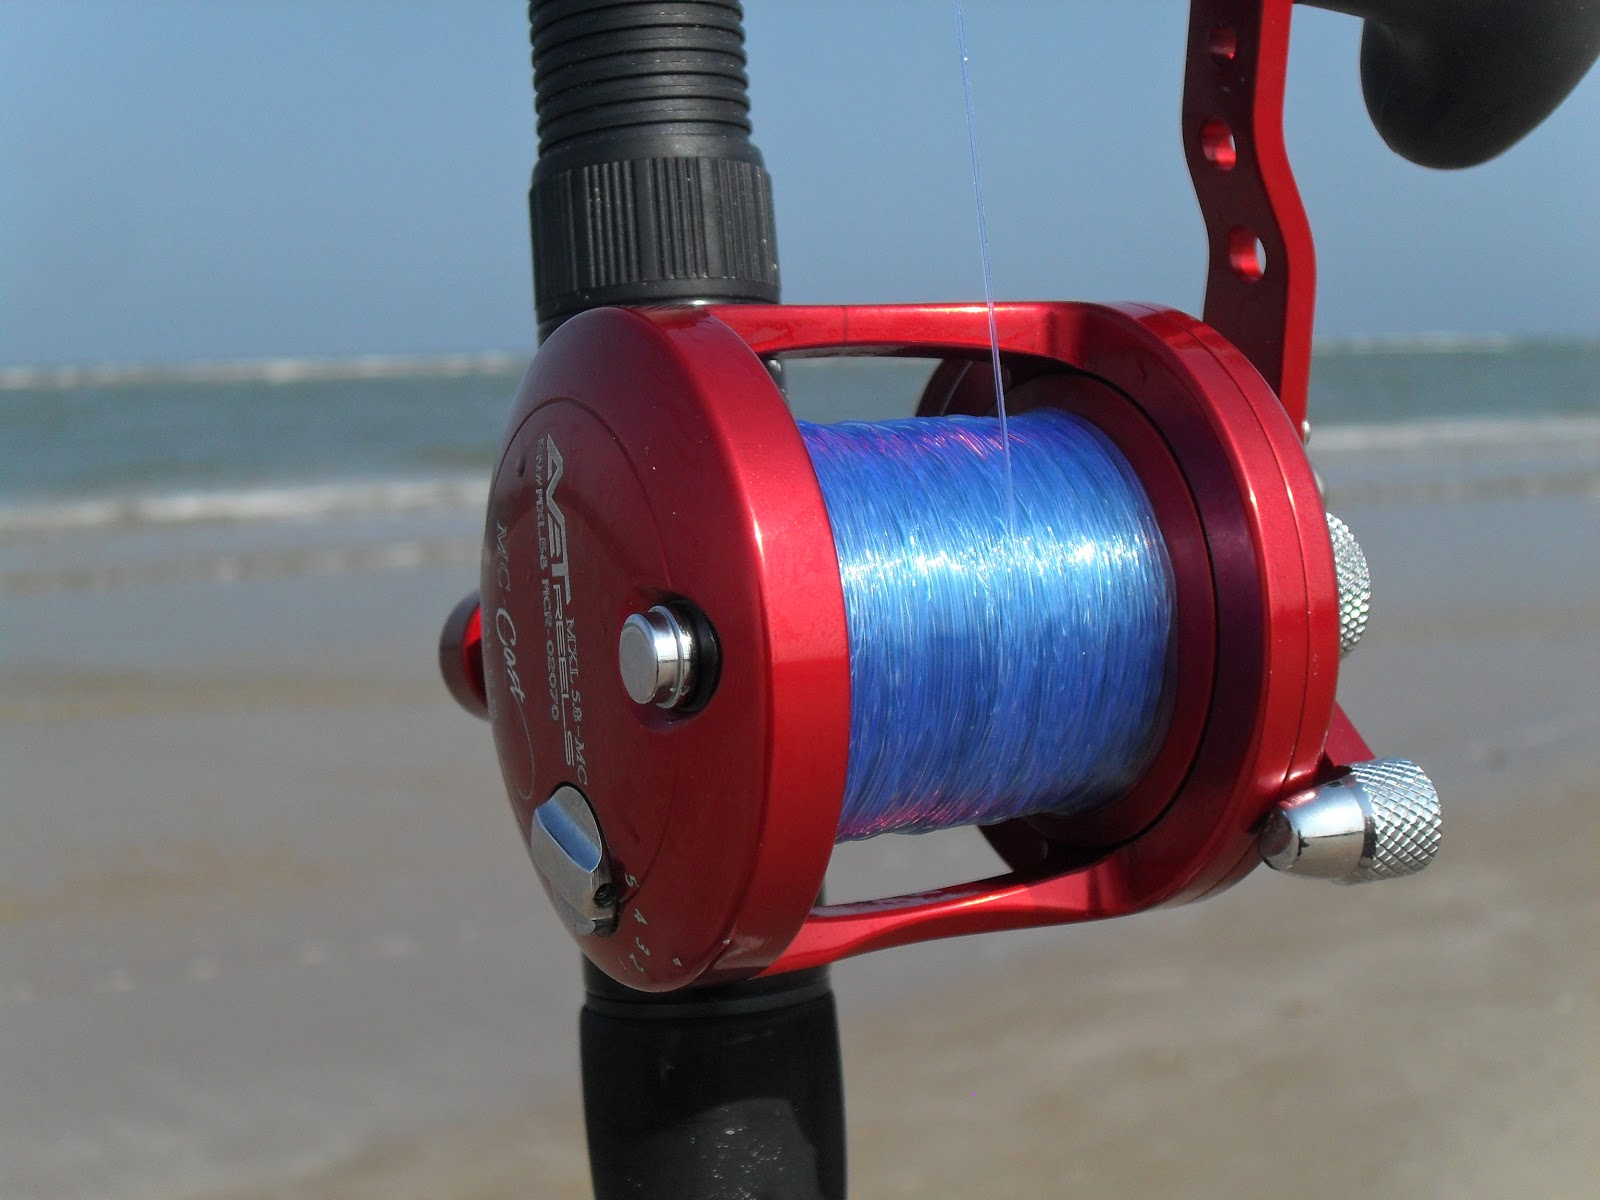 Team Shade Hats Fishing: The Gear